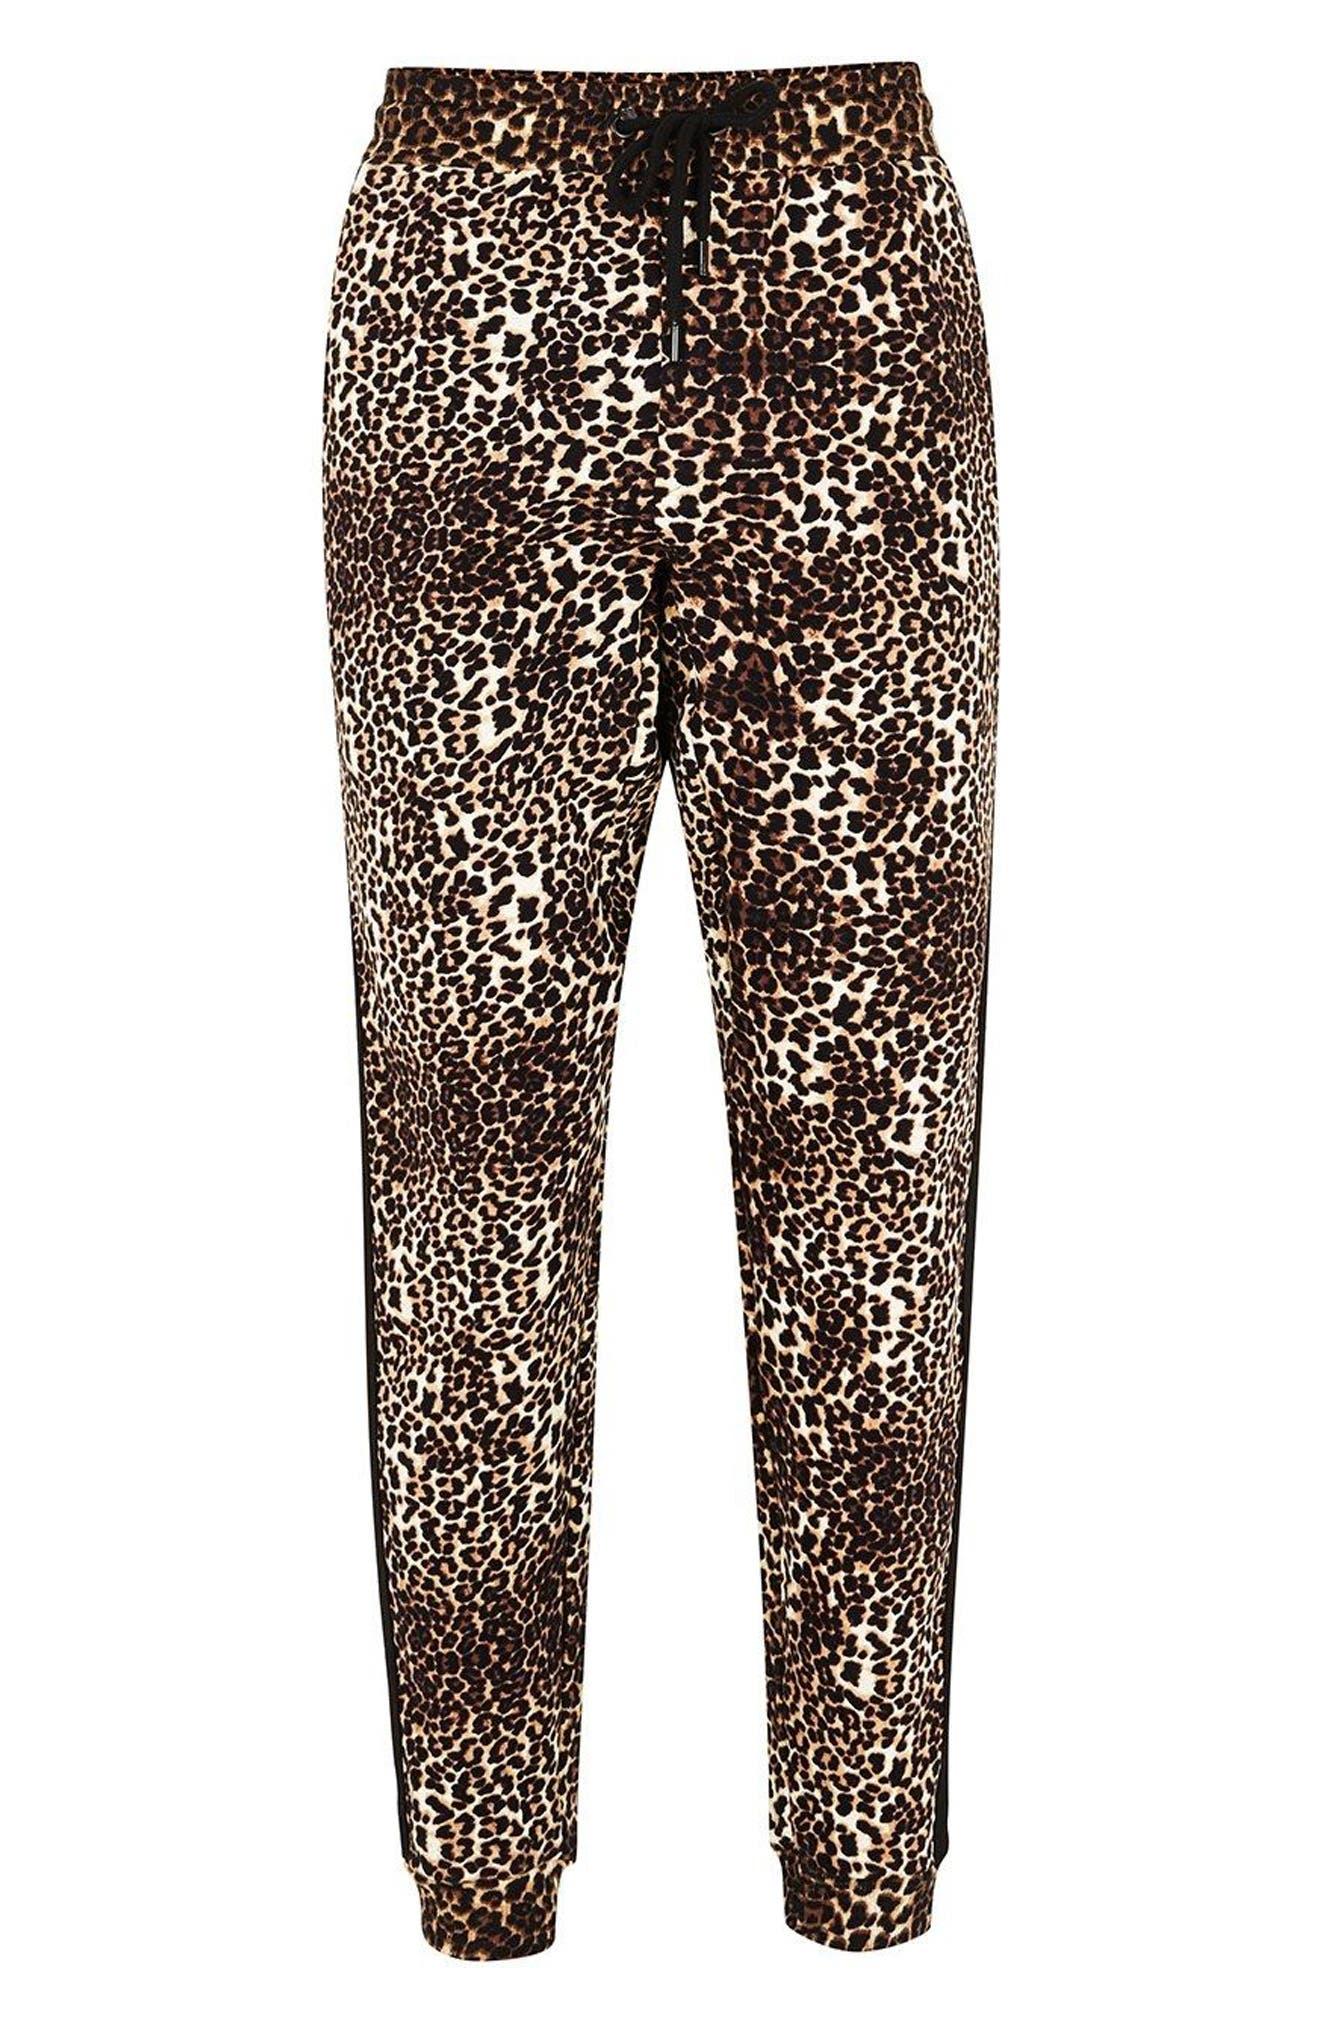 Leopard Print Tape Jogger Pants,                             Alternate thumbnail 3, color,                             Brown Multi